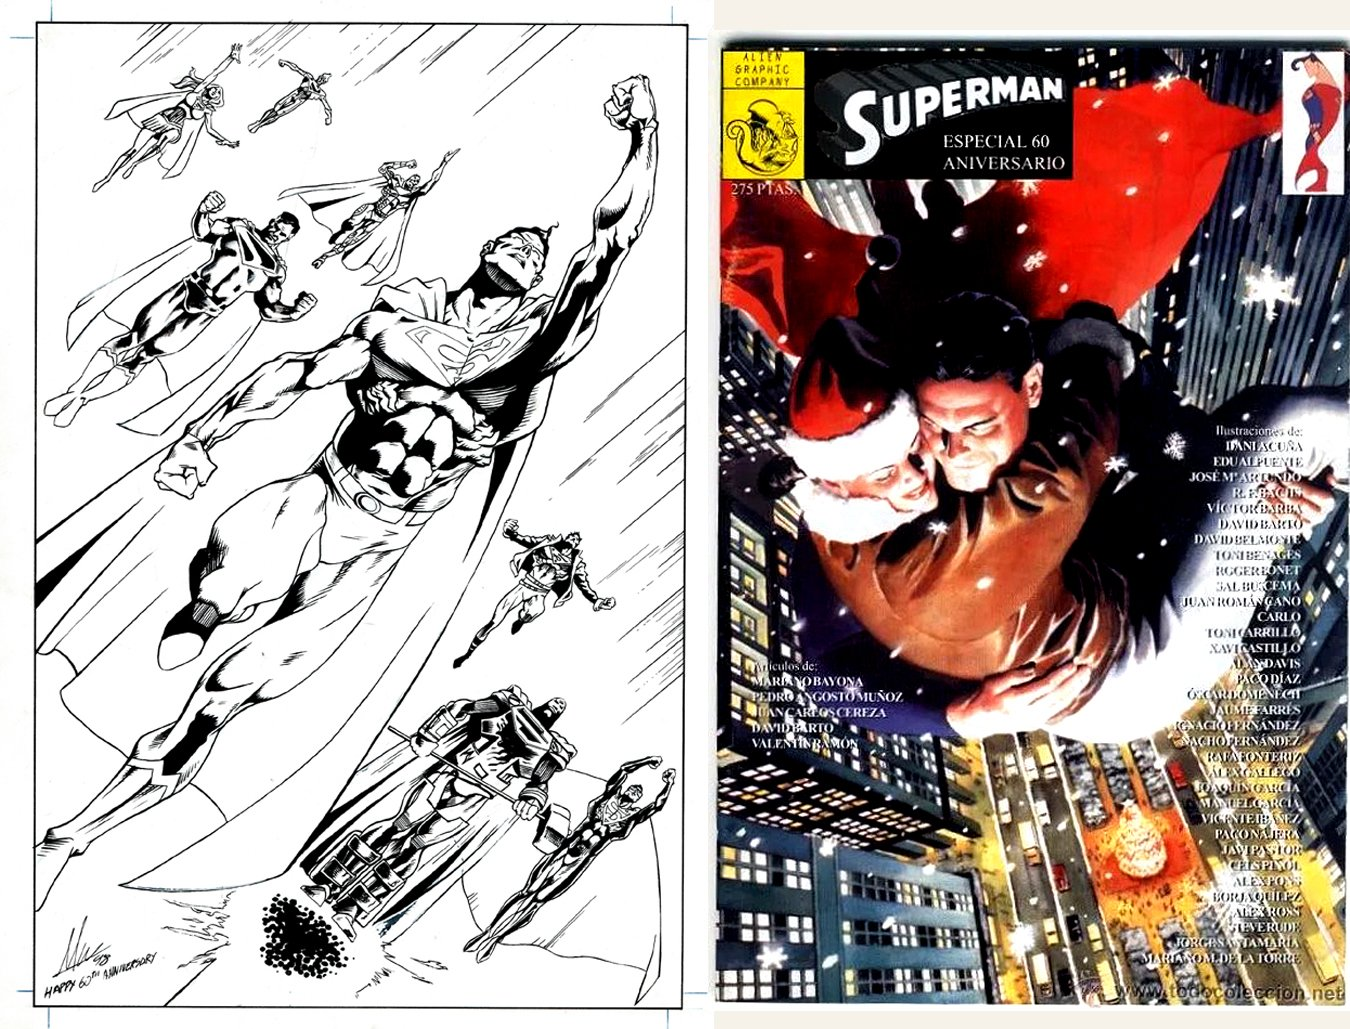 Superman Gallery p 21 SPLASH (1998)